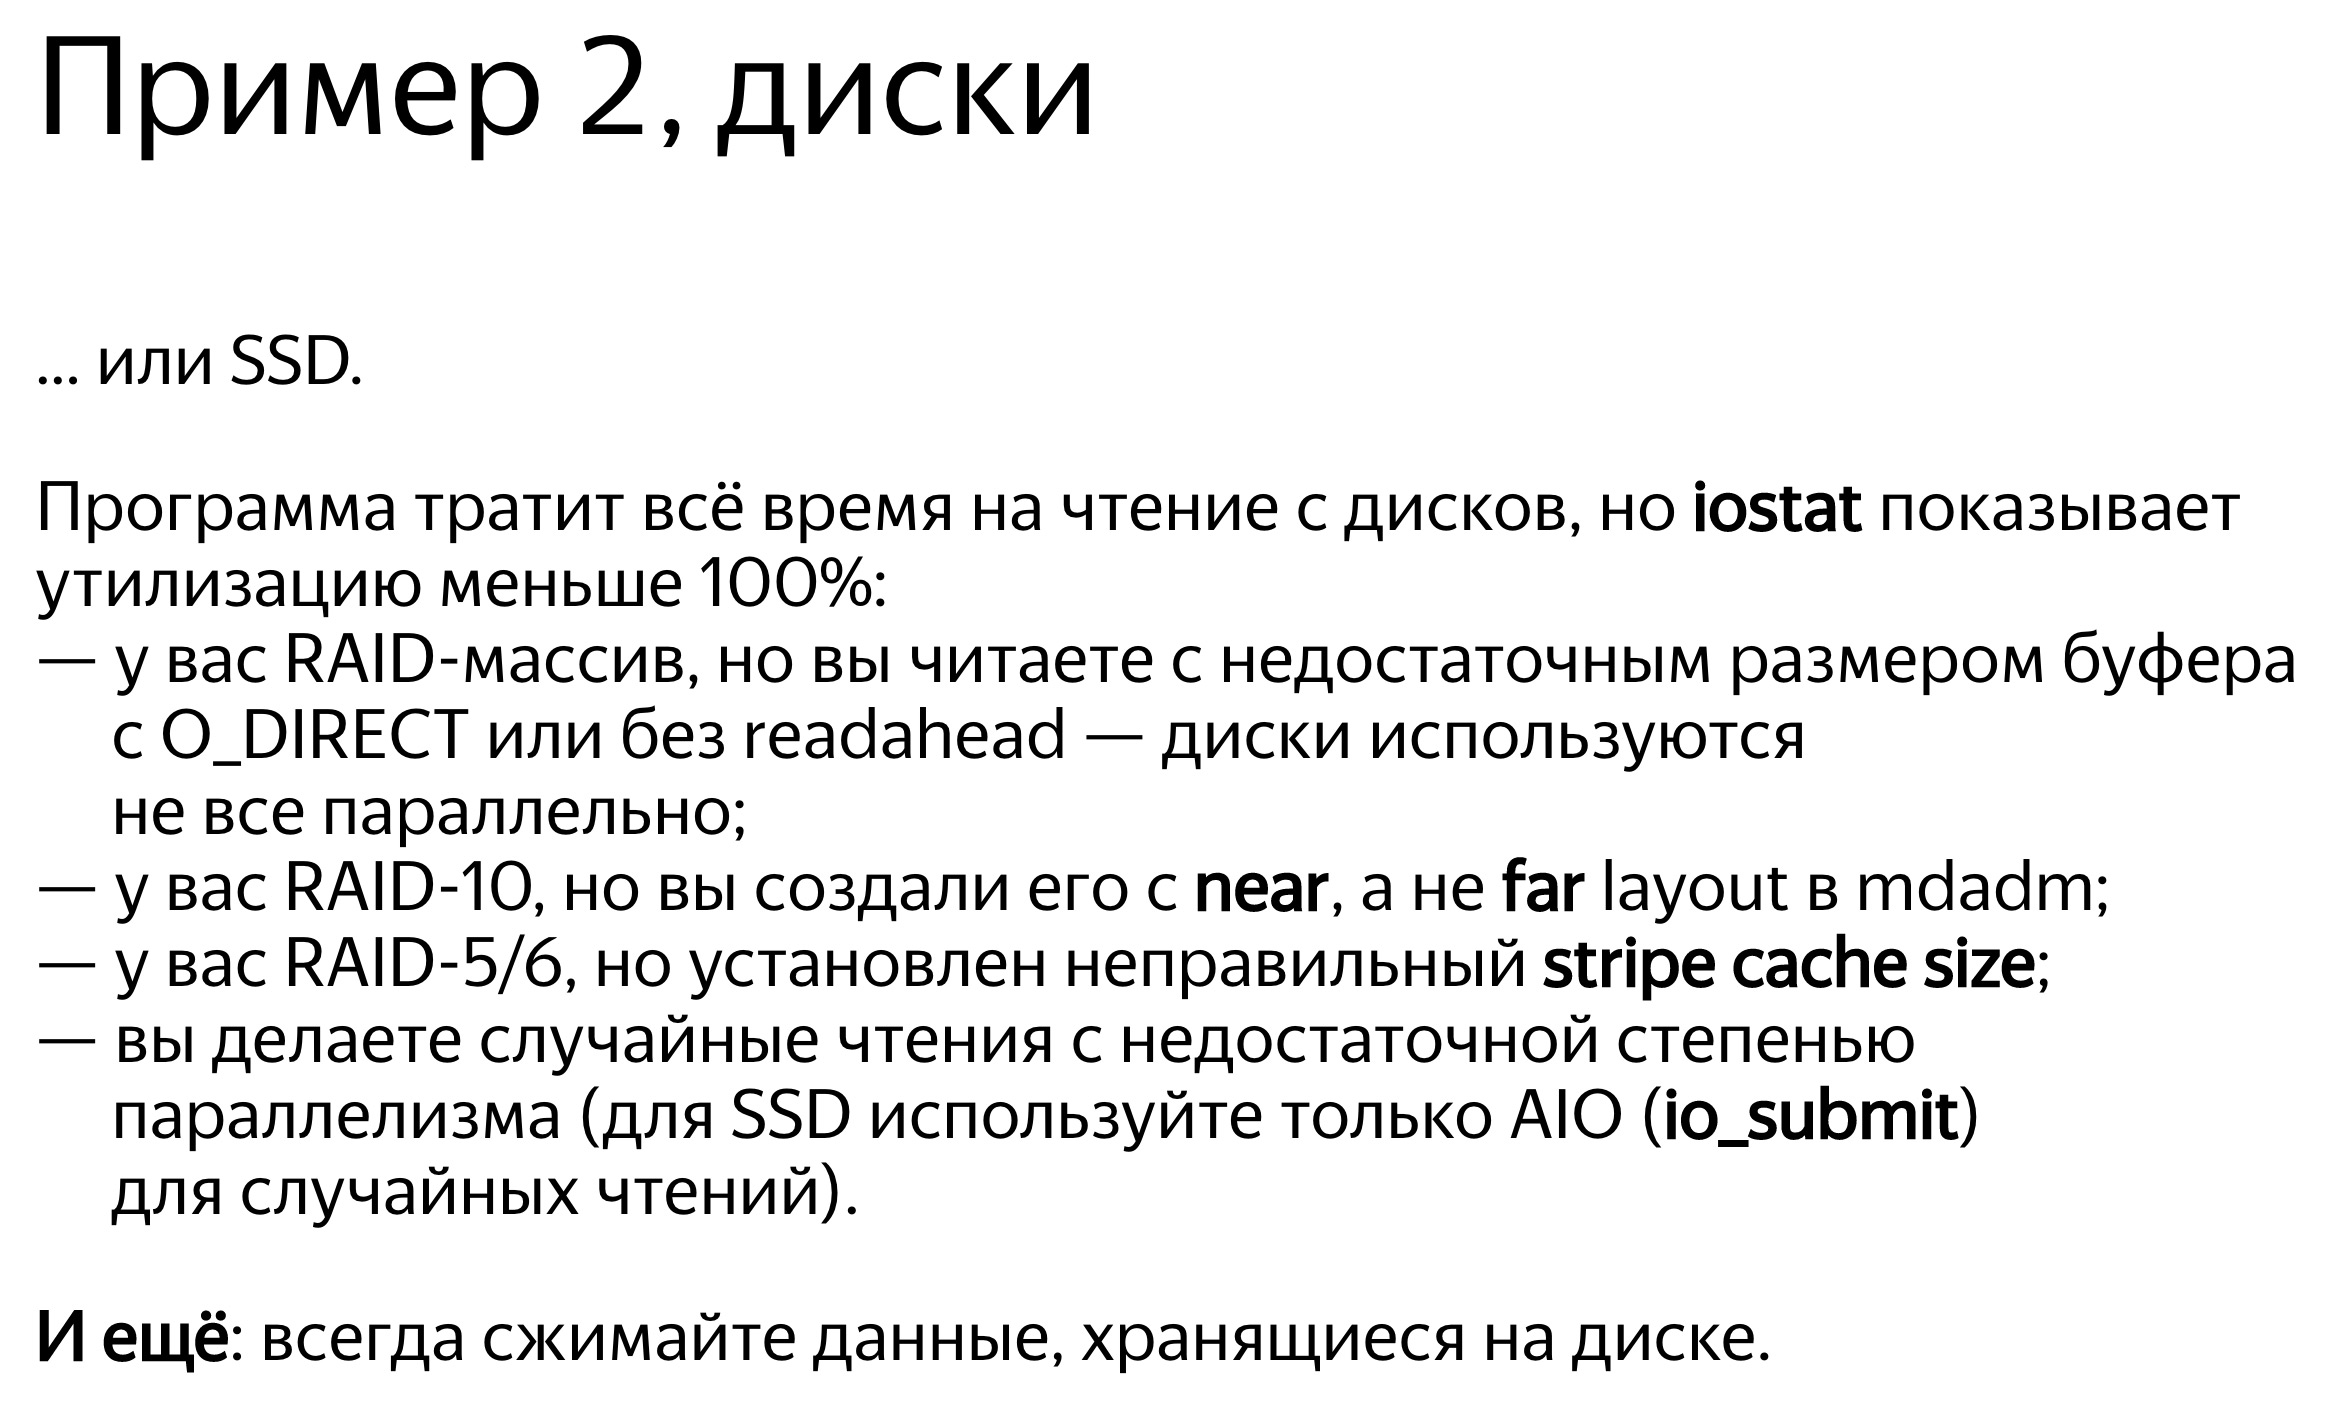 w97bediv43zlhfvat95k7qdar3k.jpeg